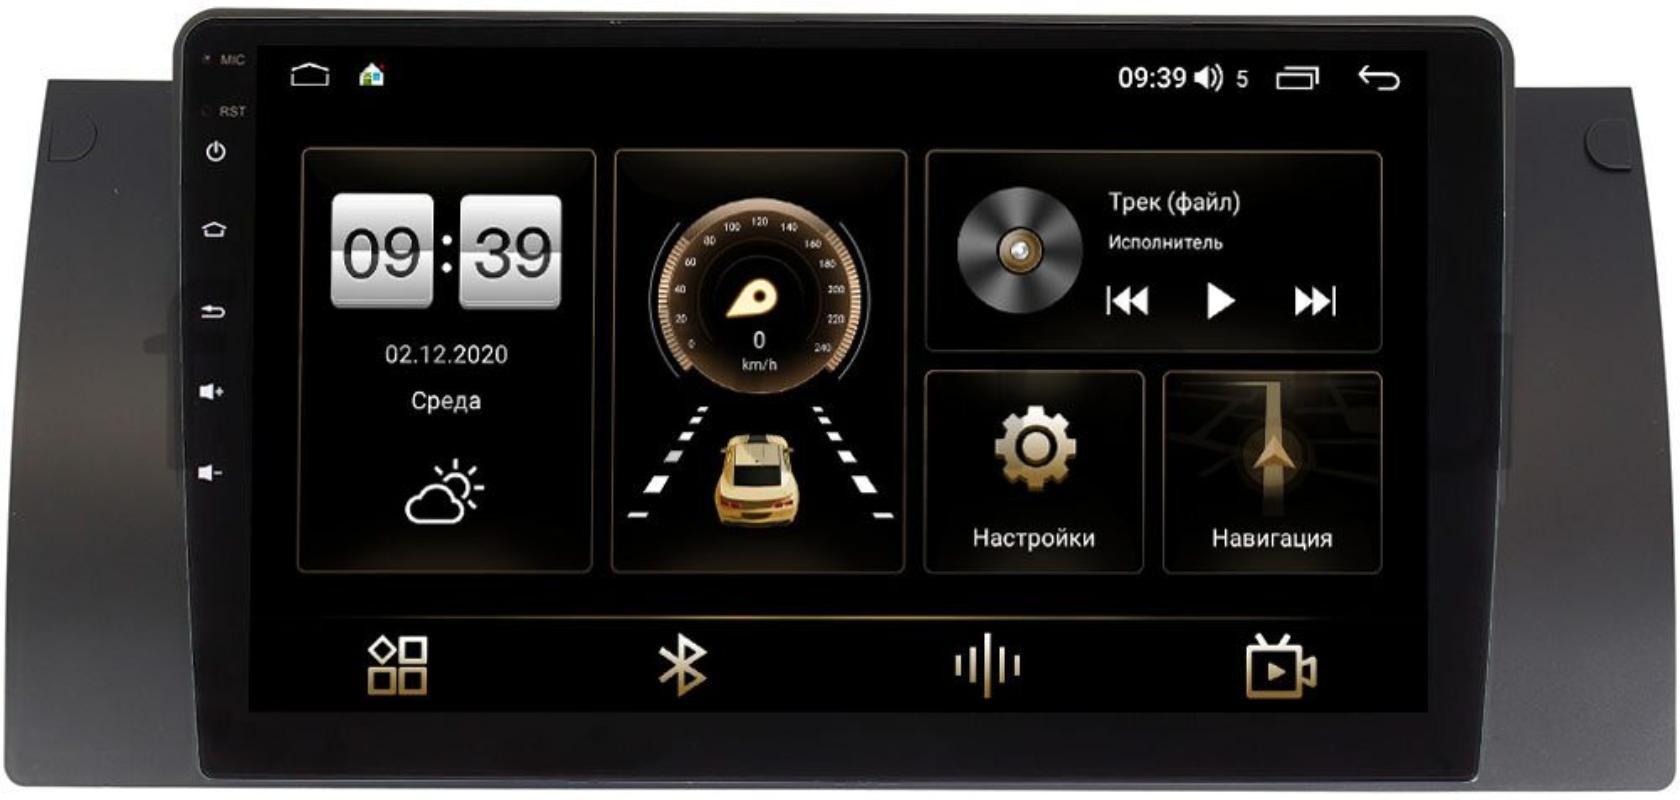 Штатная магнитола BMW 7 (E38), 5 (E39), M5 (E39), X5 (E53) LeTrun 4196-9162 на Android 10 (6/128, DSP, QLed) С оптическим выходом (+ Камера заднего вида в подарок!)